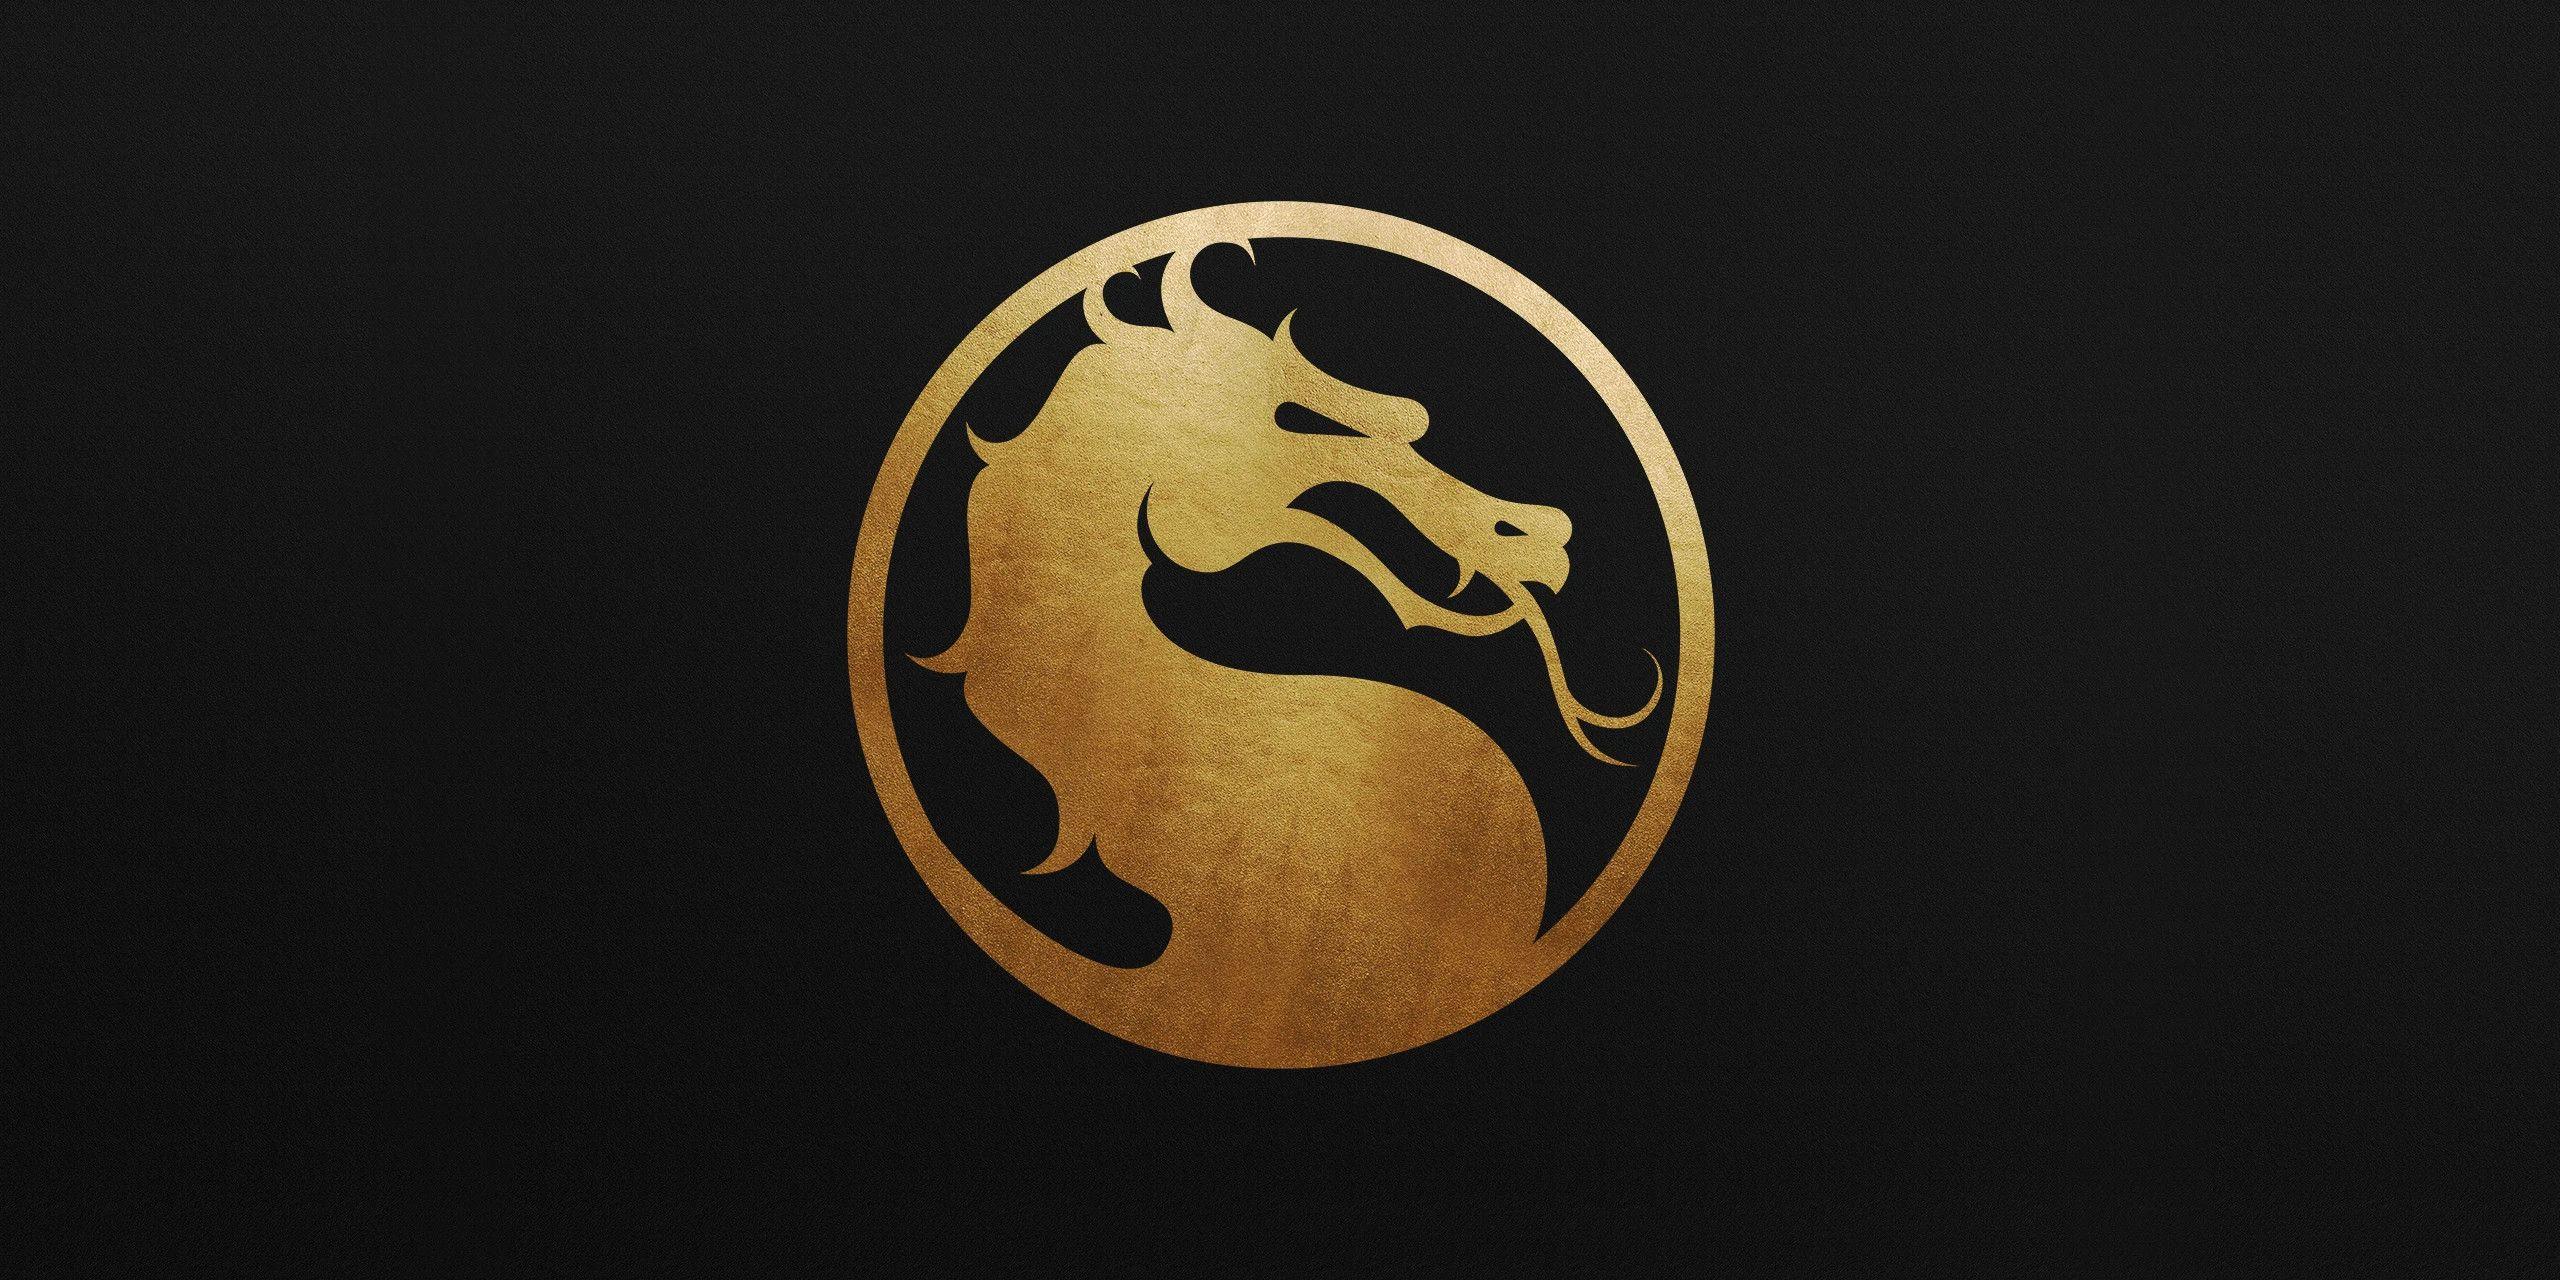 Rumor: Mortal Kombat 11 Leak Reveals New Kombat Pack 2 Details